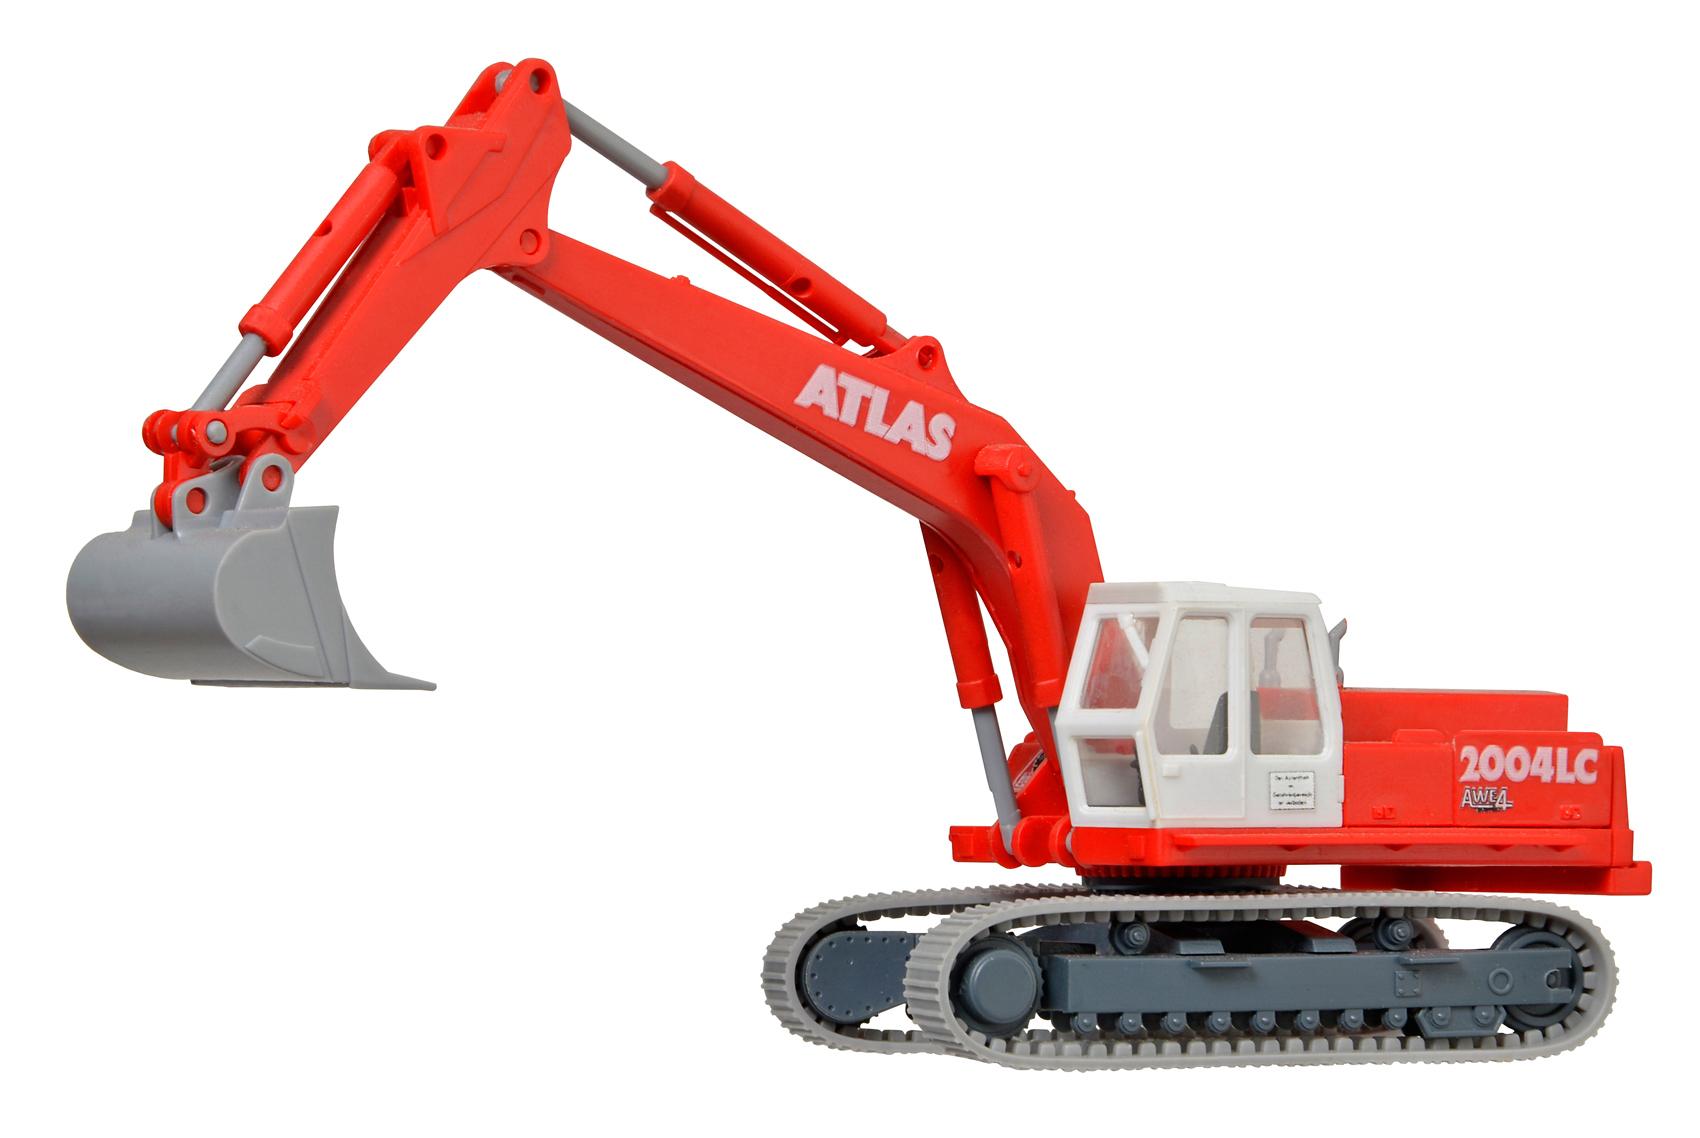 kibri 11250 <br/>ATLAS Raupenbagger 2004 LC